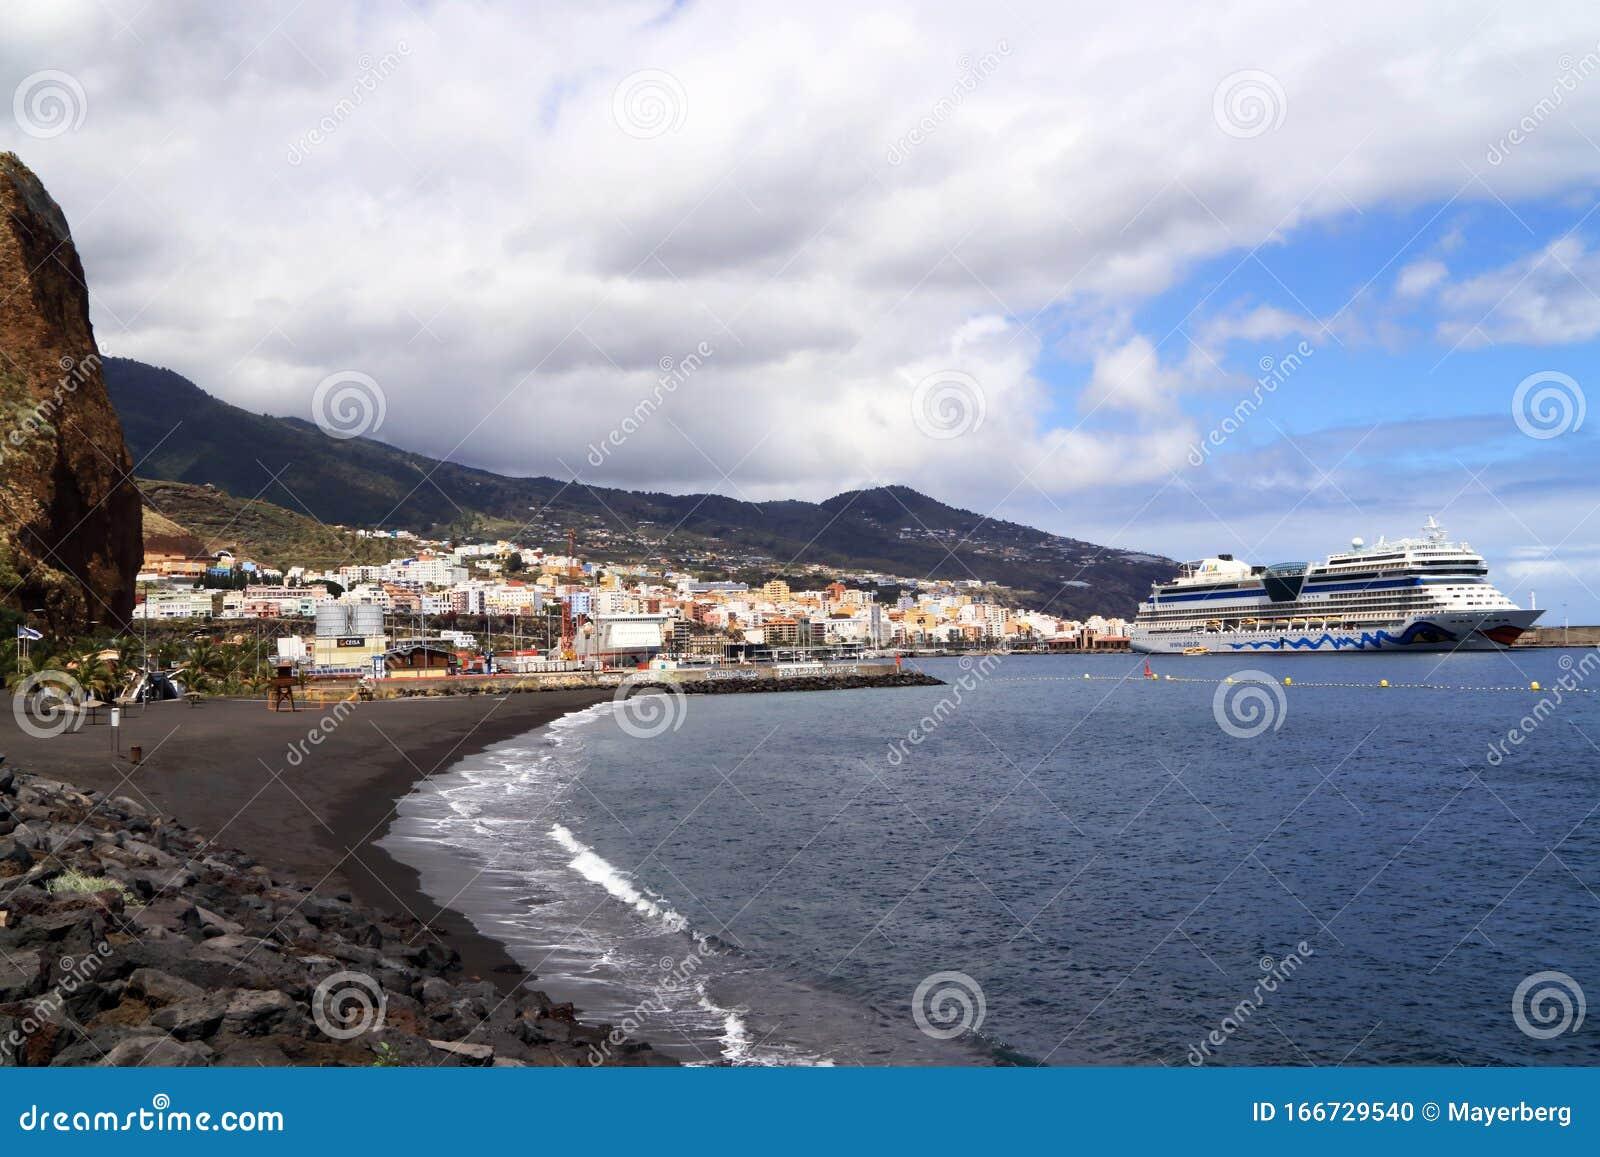 Coast Of Canary Island La Palma With City And Porto Of Santa Cruz